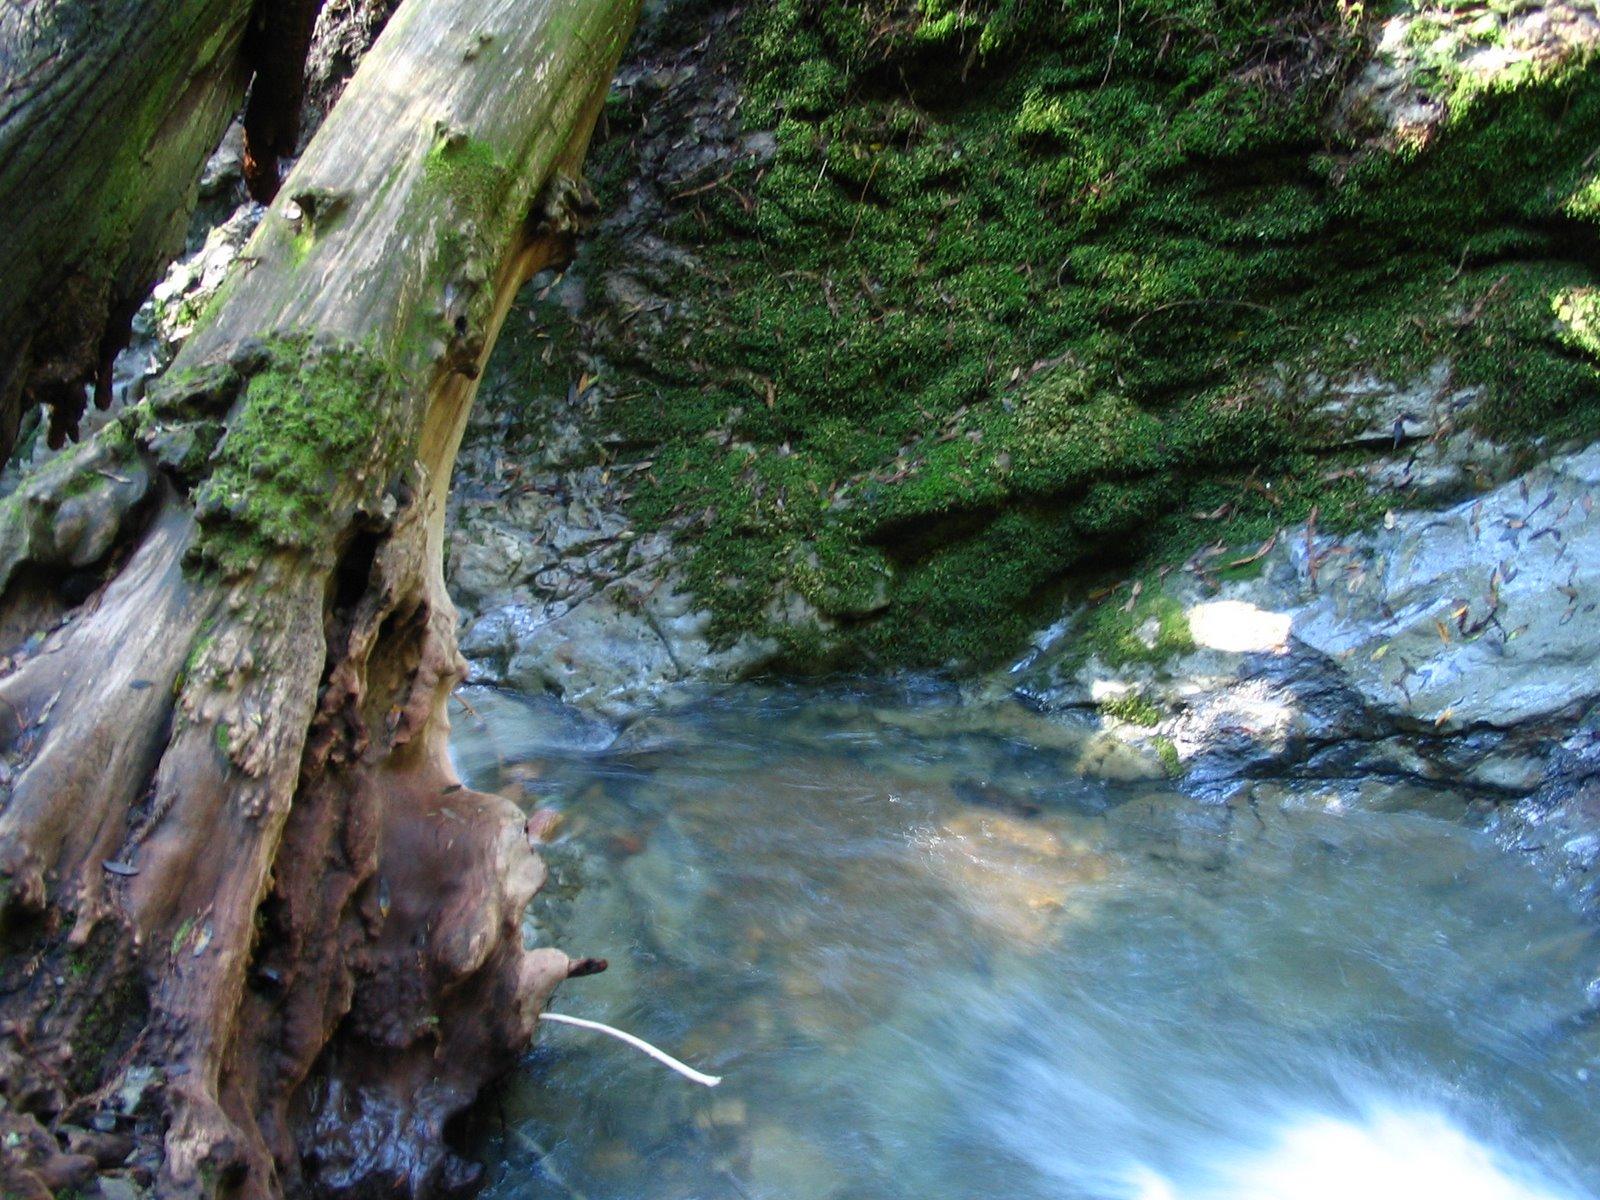 [Mt.+Tamalpais+State+Park+-+Matt+Davis+Steep+Ravine+Loop+063.jpg]